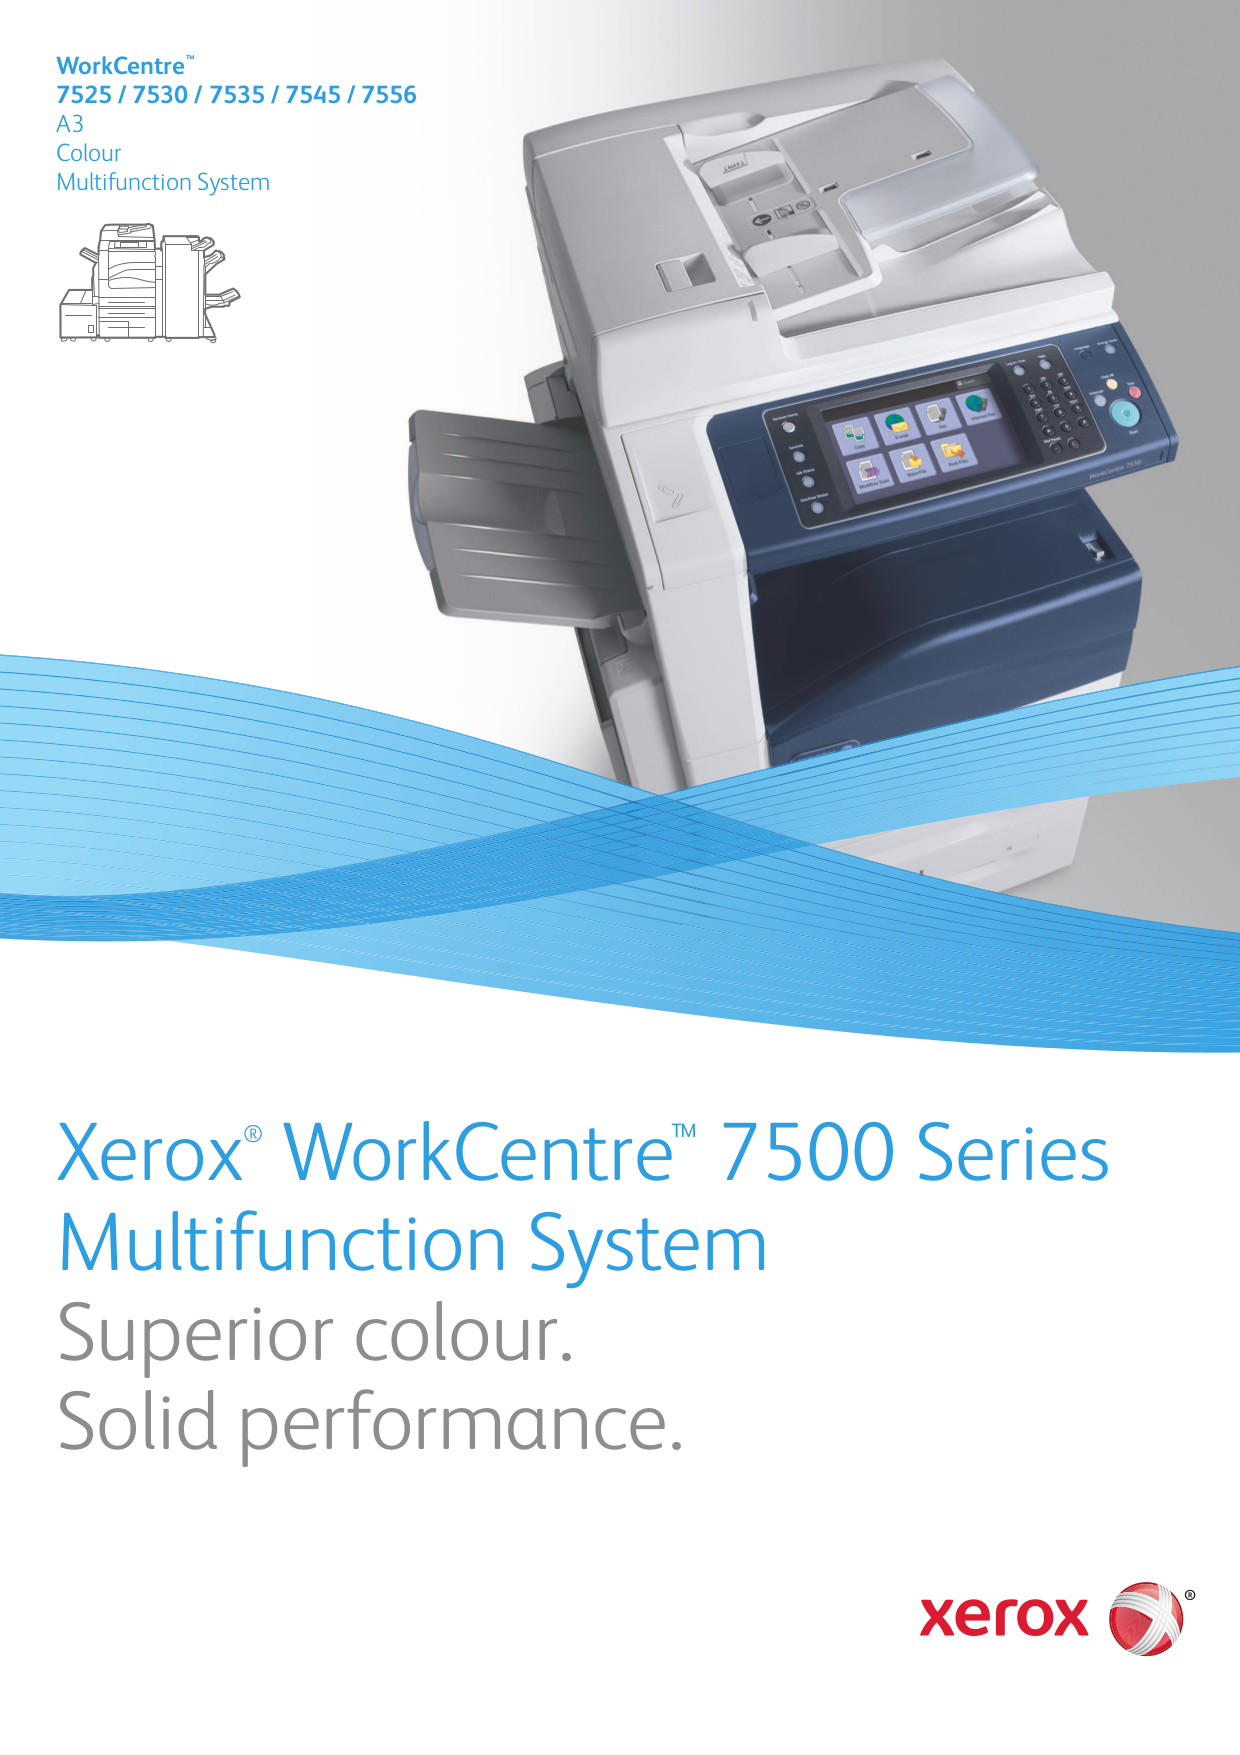 download free pdf for xerox workcentre 7335 multifunction printer manual rh umlib com xerox workcentre 7335 service manual xerox wc 7335 service manual